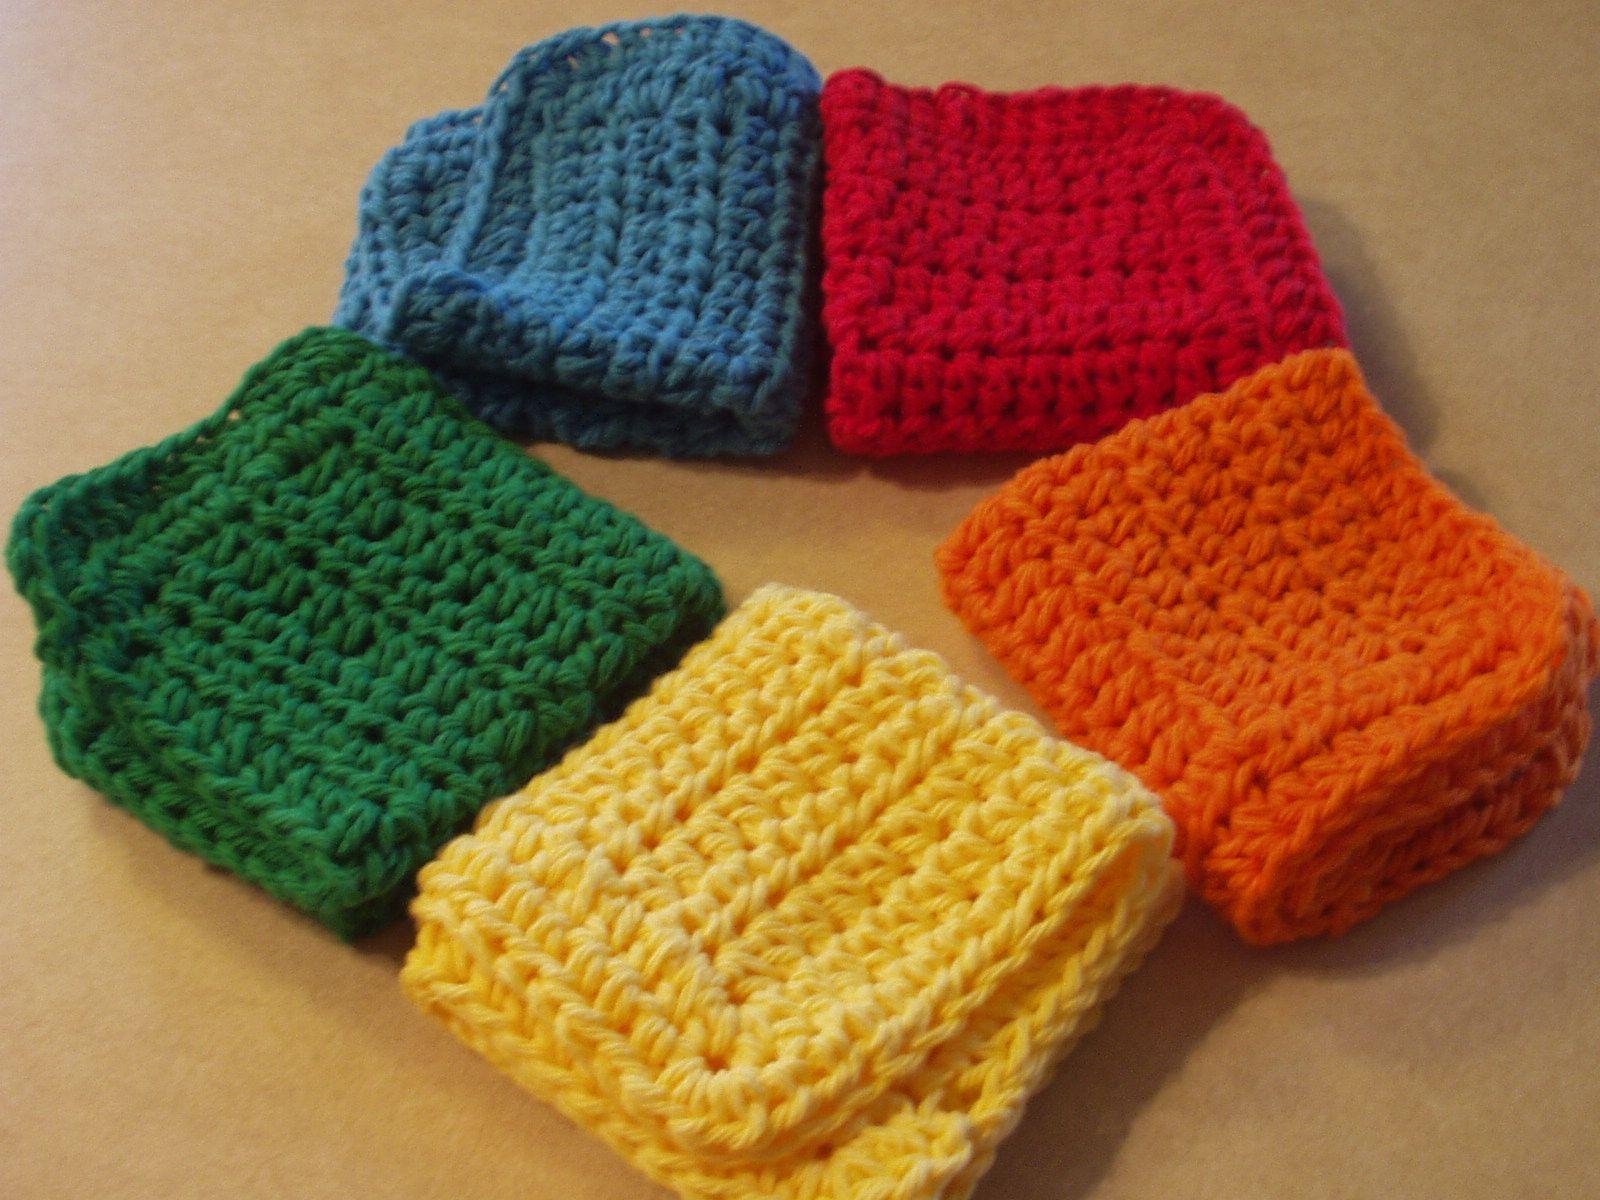 Crochet my favorite dishcloth dishcloth and free crochet vintage crochet patterns bankloansurffo Gallery